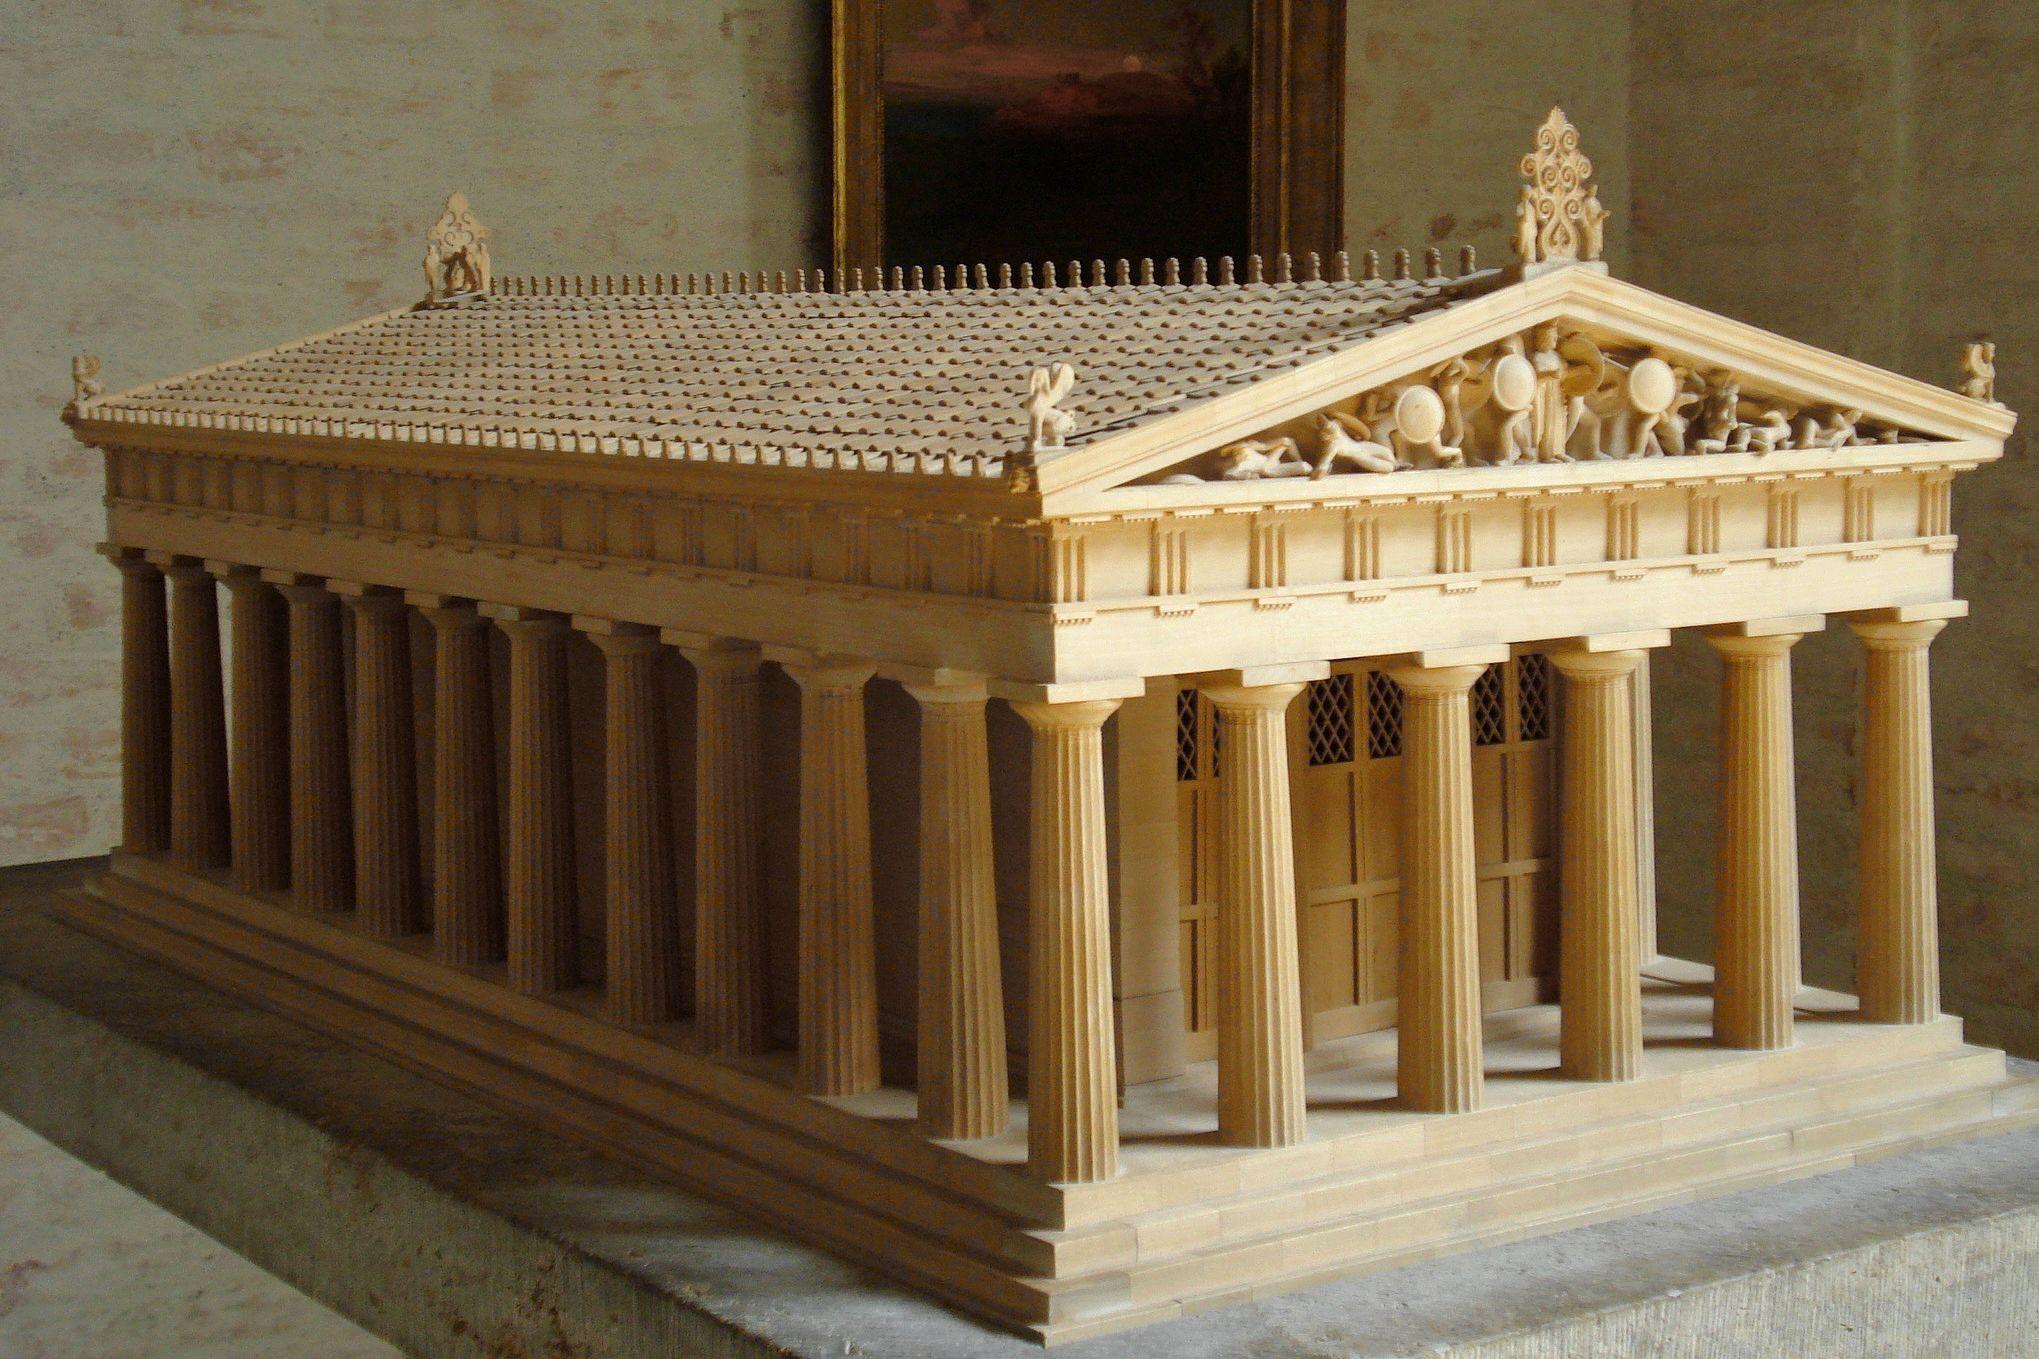 greek architecture crystalinks - HD2039×1359